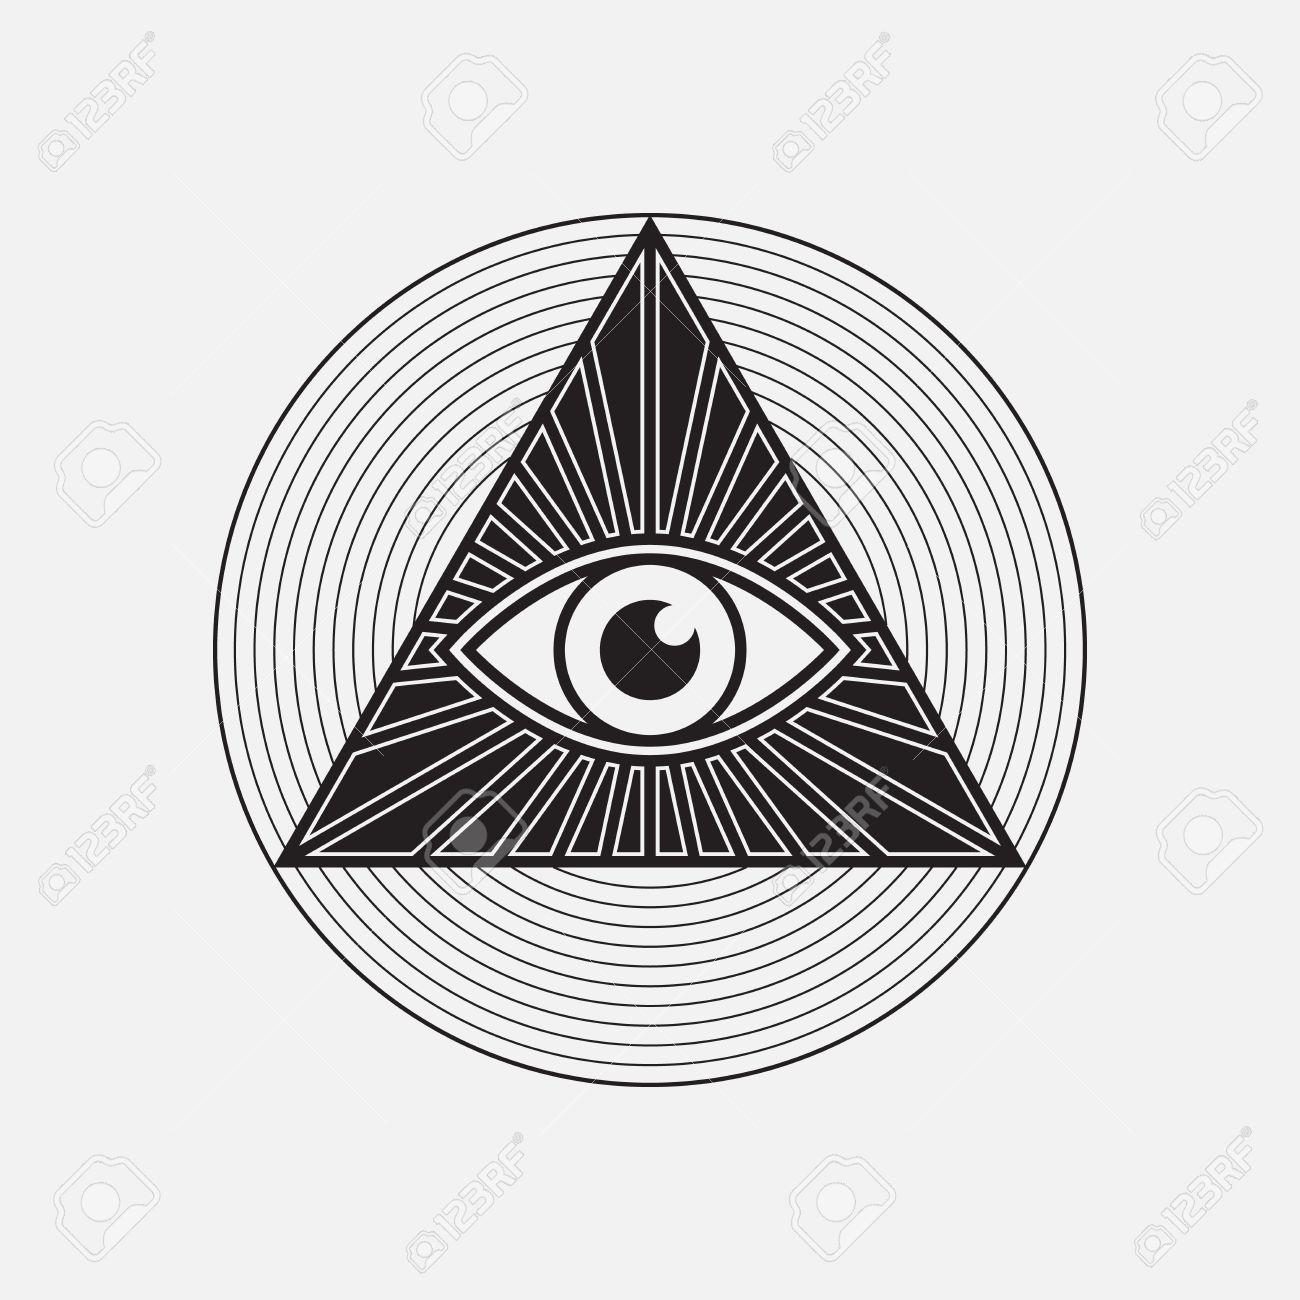 Symbols Of The Illuminati All Seeing Eye And Pyramid Black